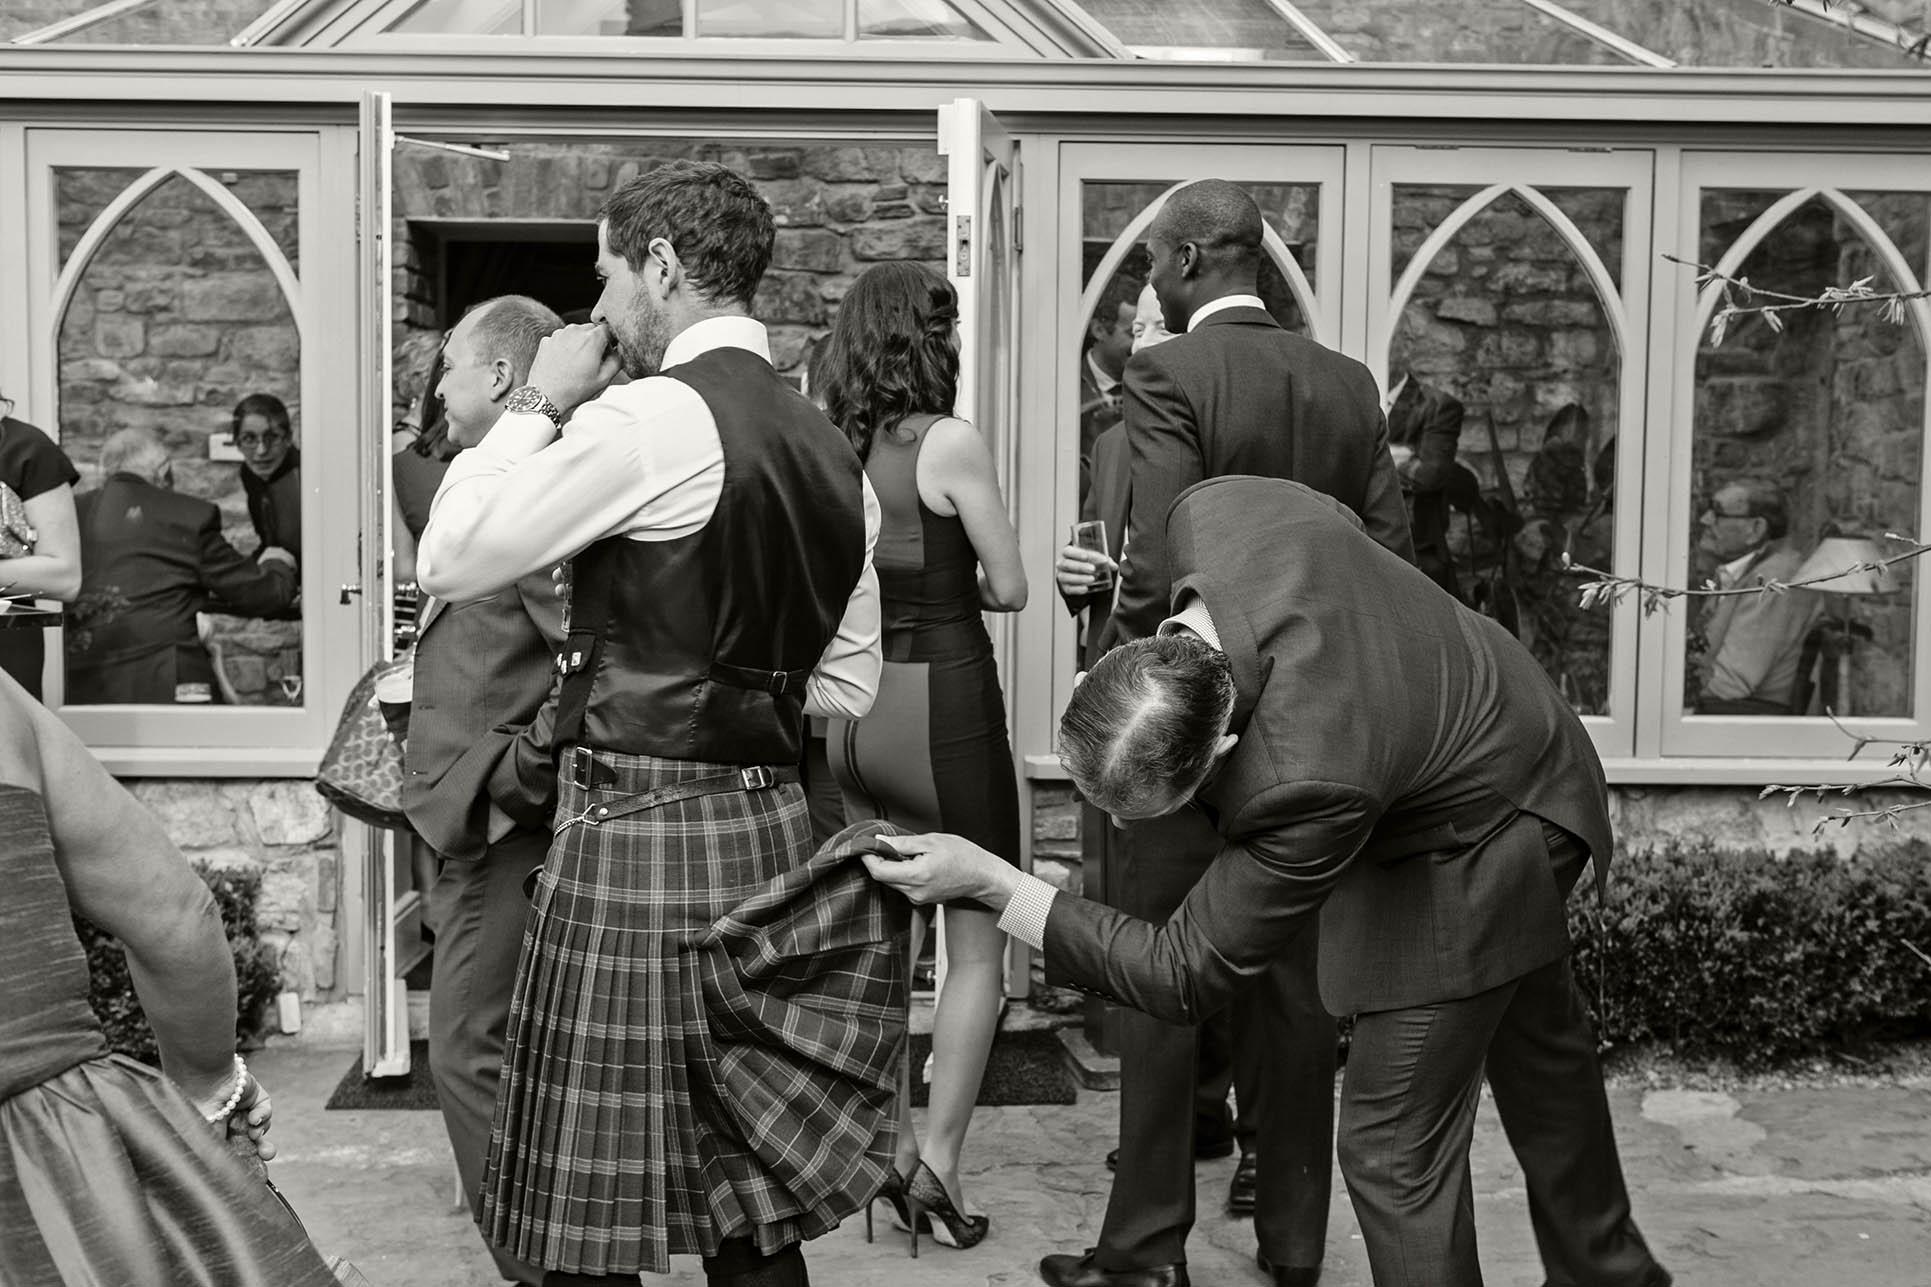 Ballymagarvey wedding, opportune funny photographs at wedding